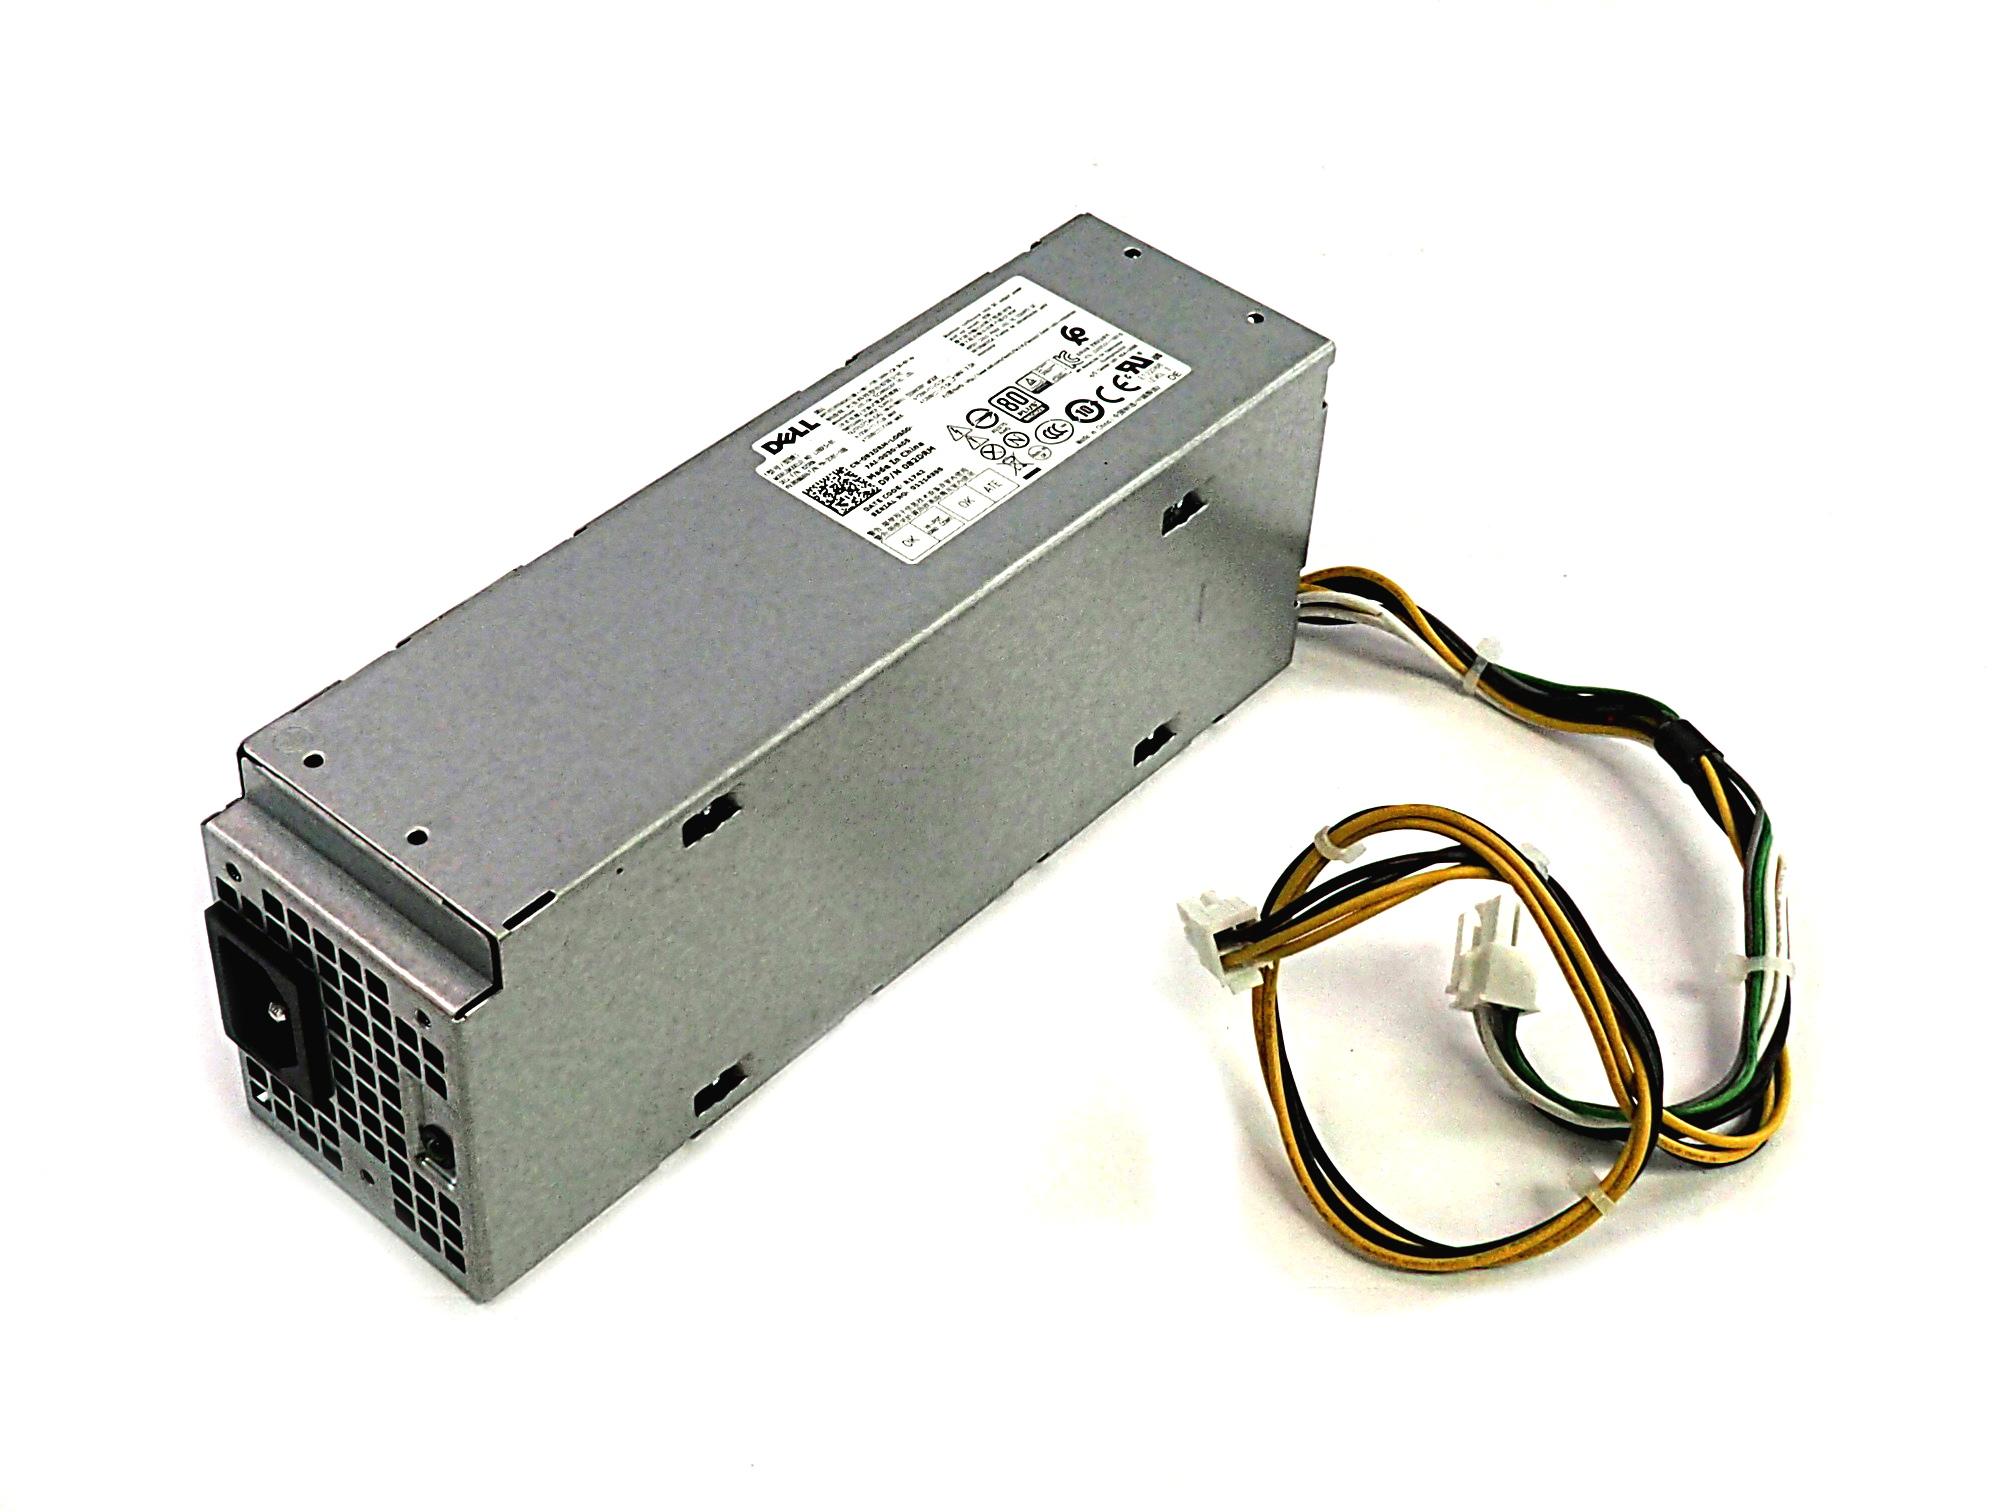 Dell 82DRM Model: L180ES-01 180W Switching Power Supply f/ OptiPlex 5050 SFF PC